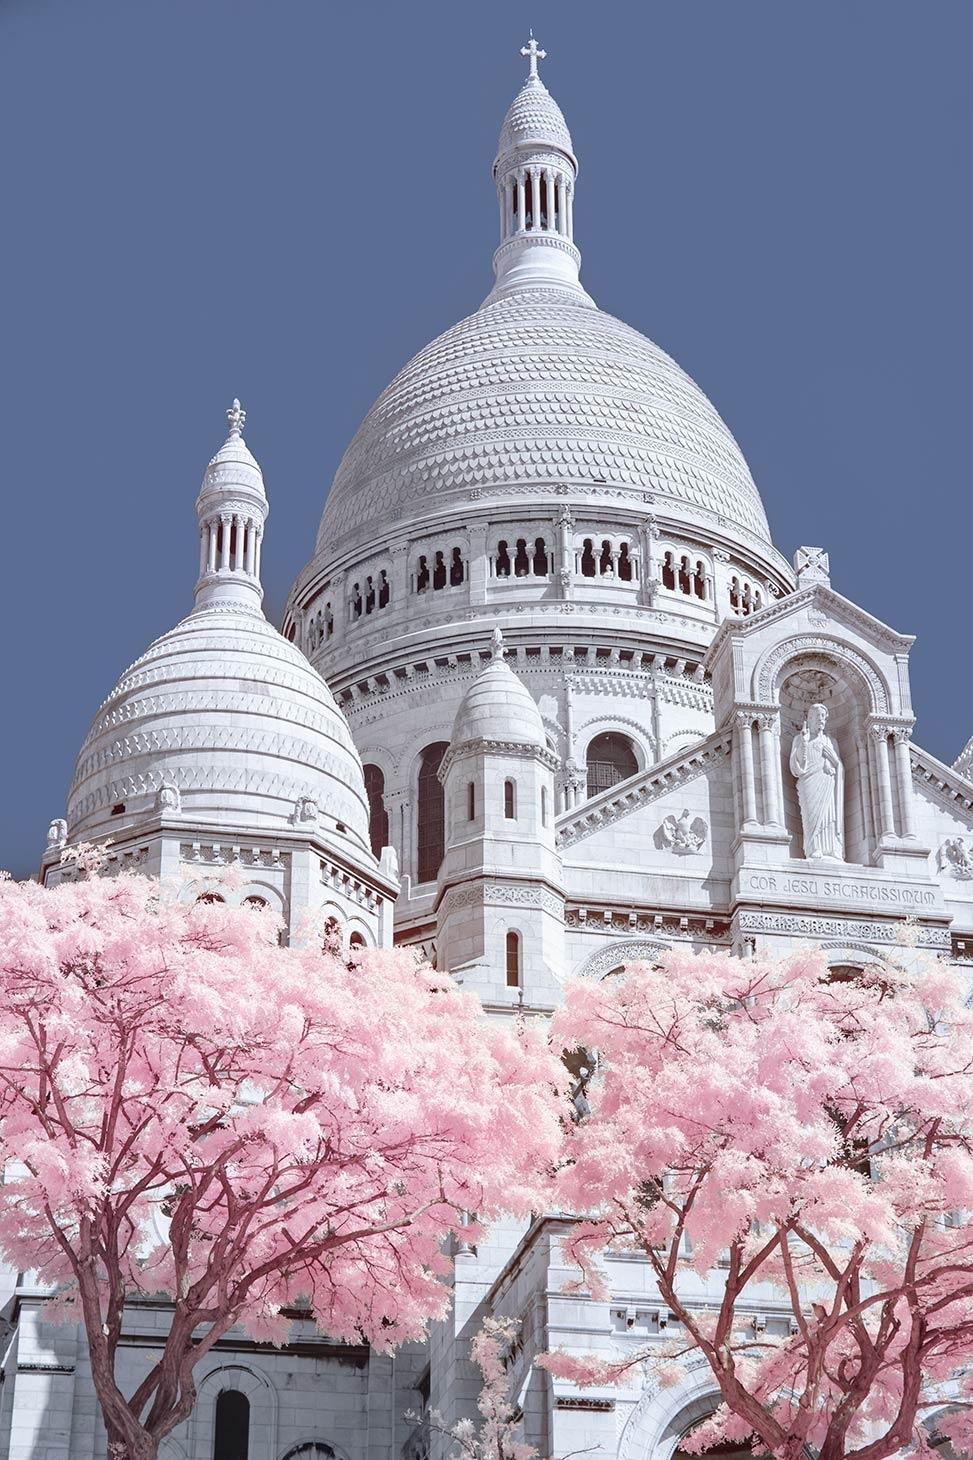 Paris in Pink - Shooting Infrared in Paris